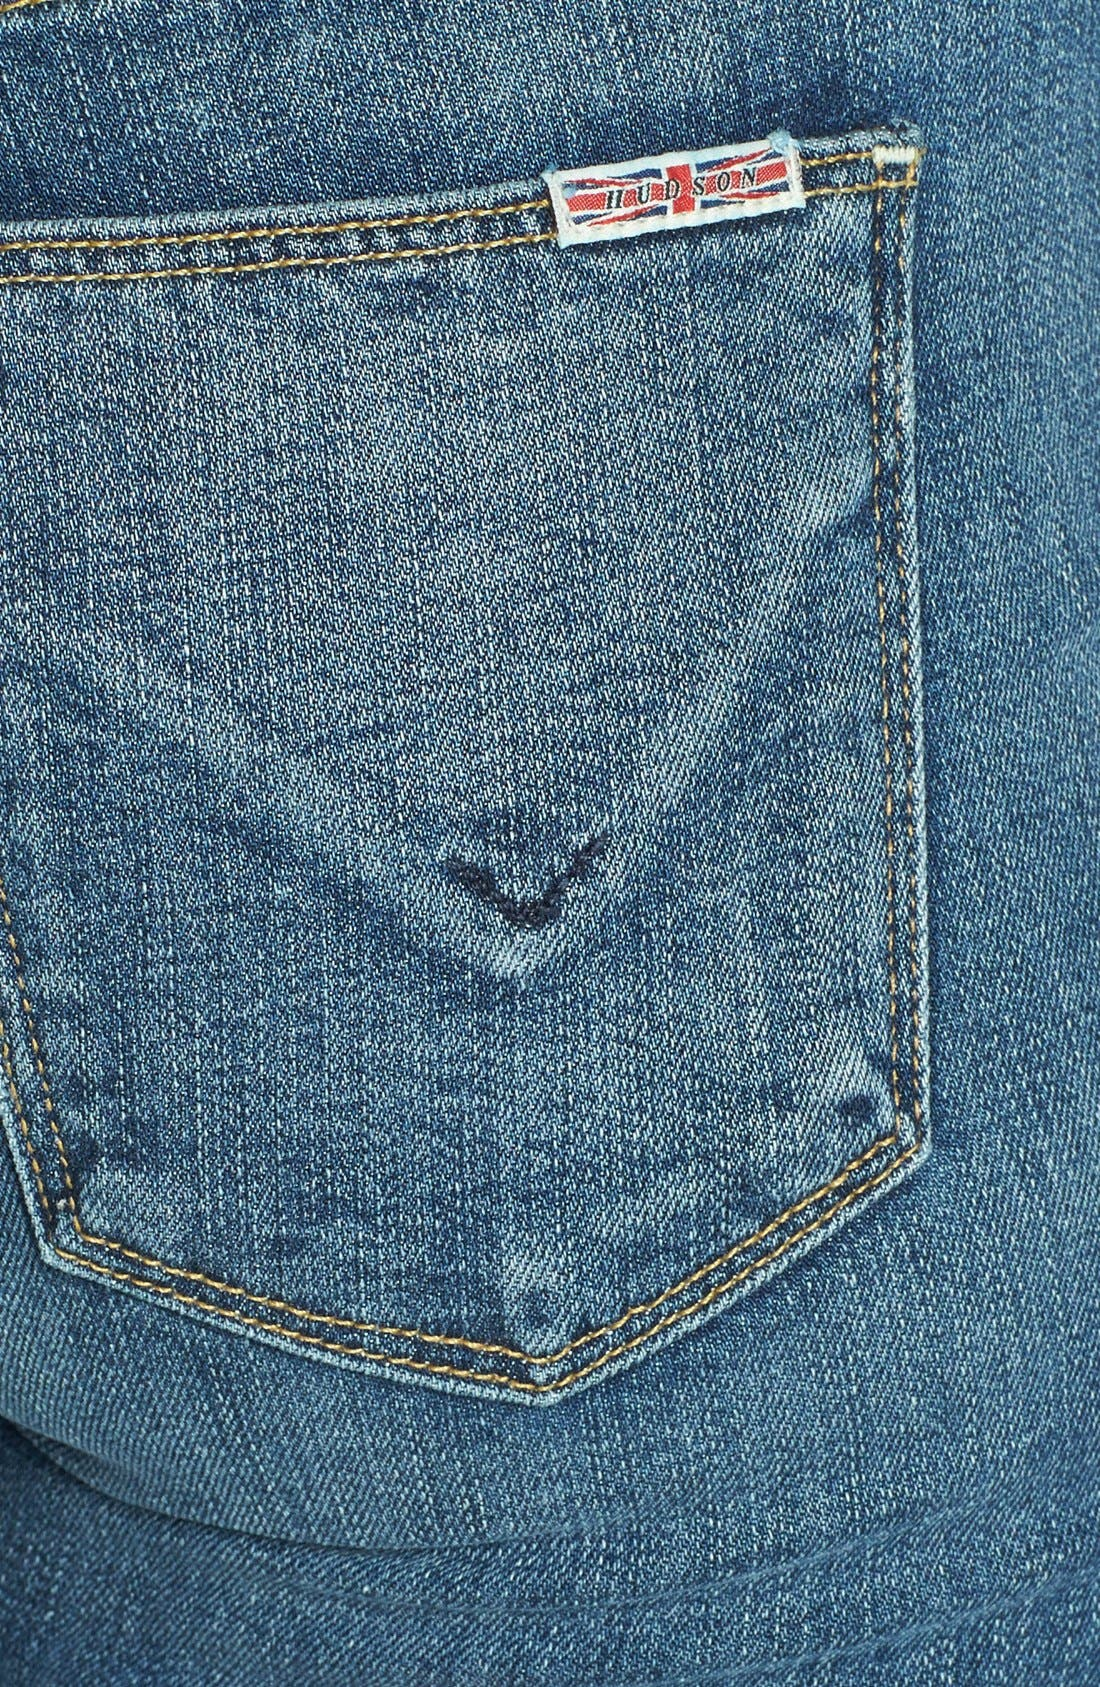 Alternate Image 3  - Hudson Jeans 'Elle' Baby Bootcut Jeans (Hackney)